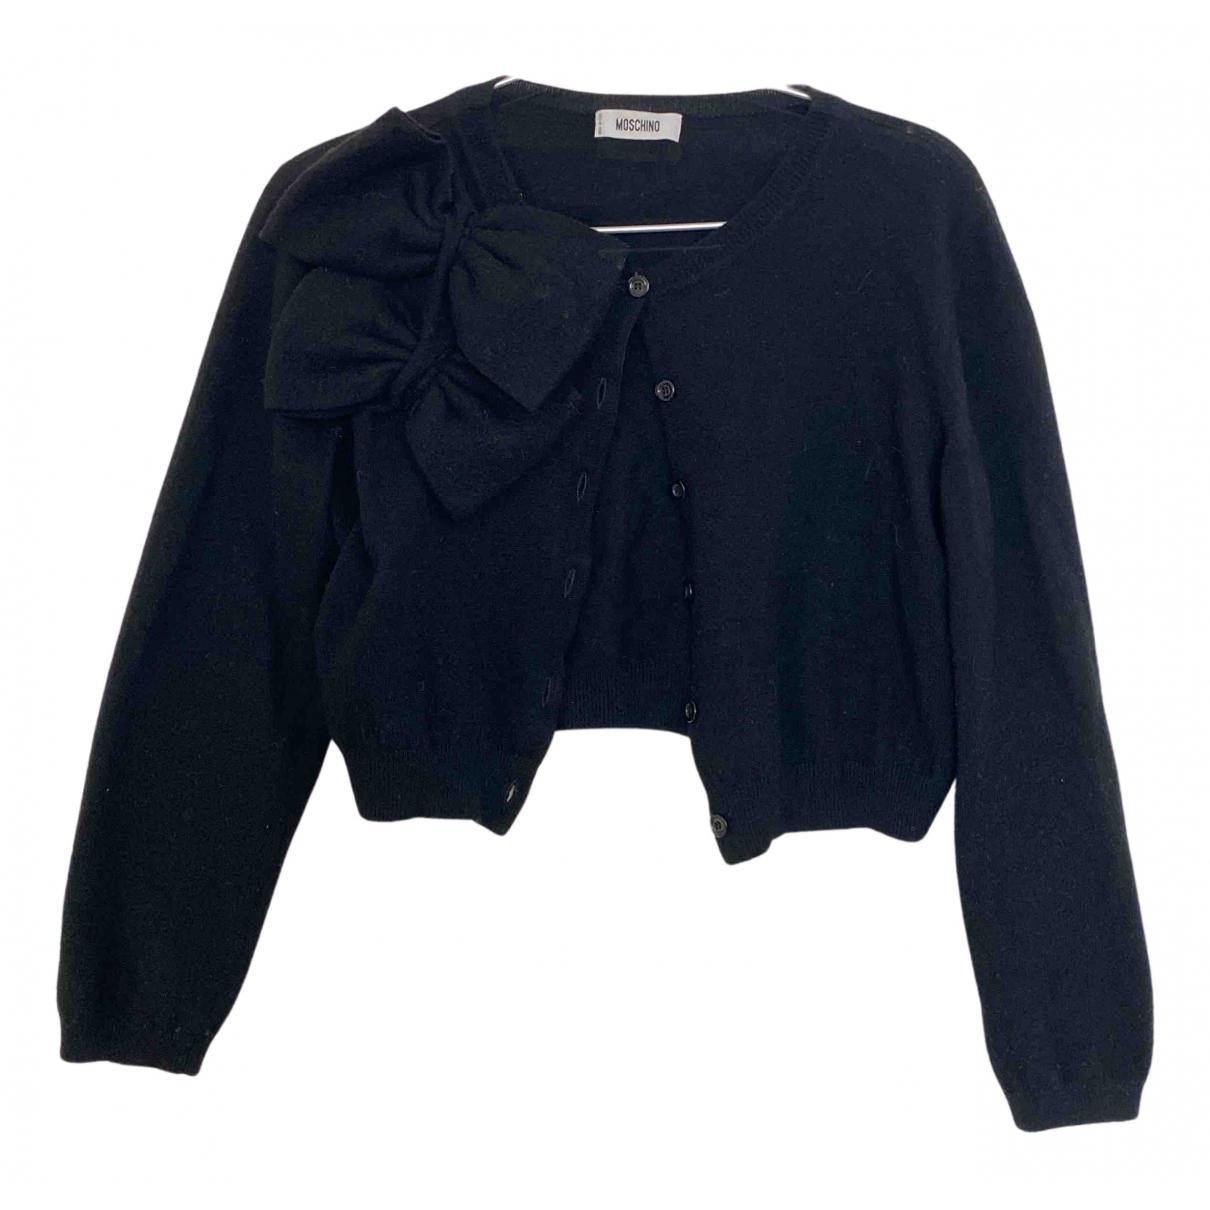 Moschino N Black Wool Knitwear for Women 34 FR